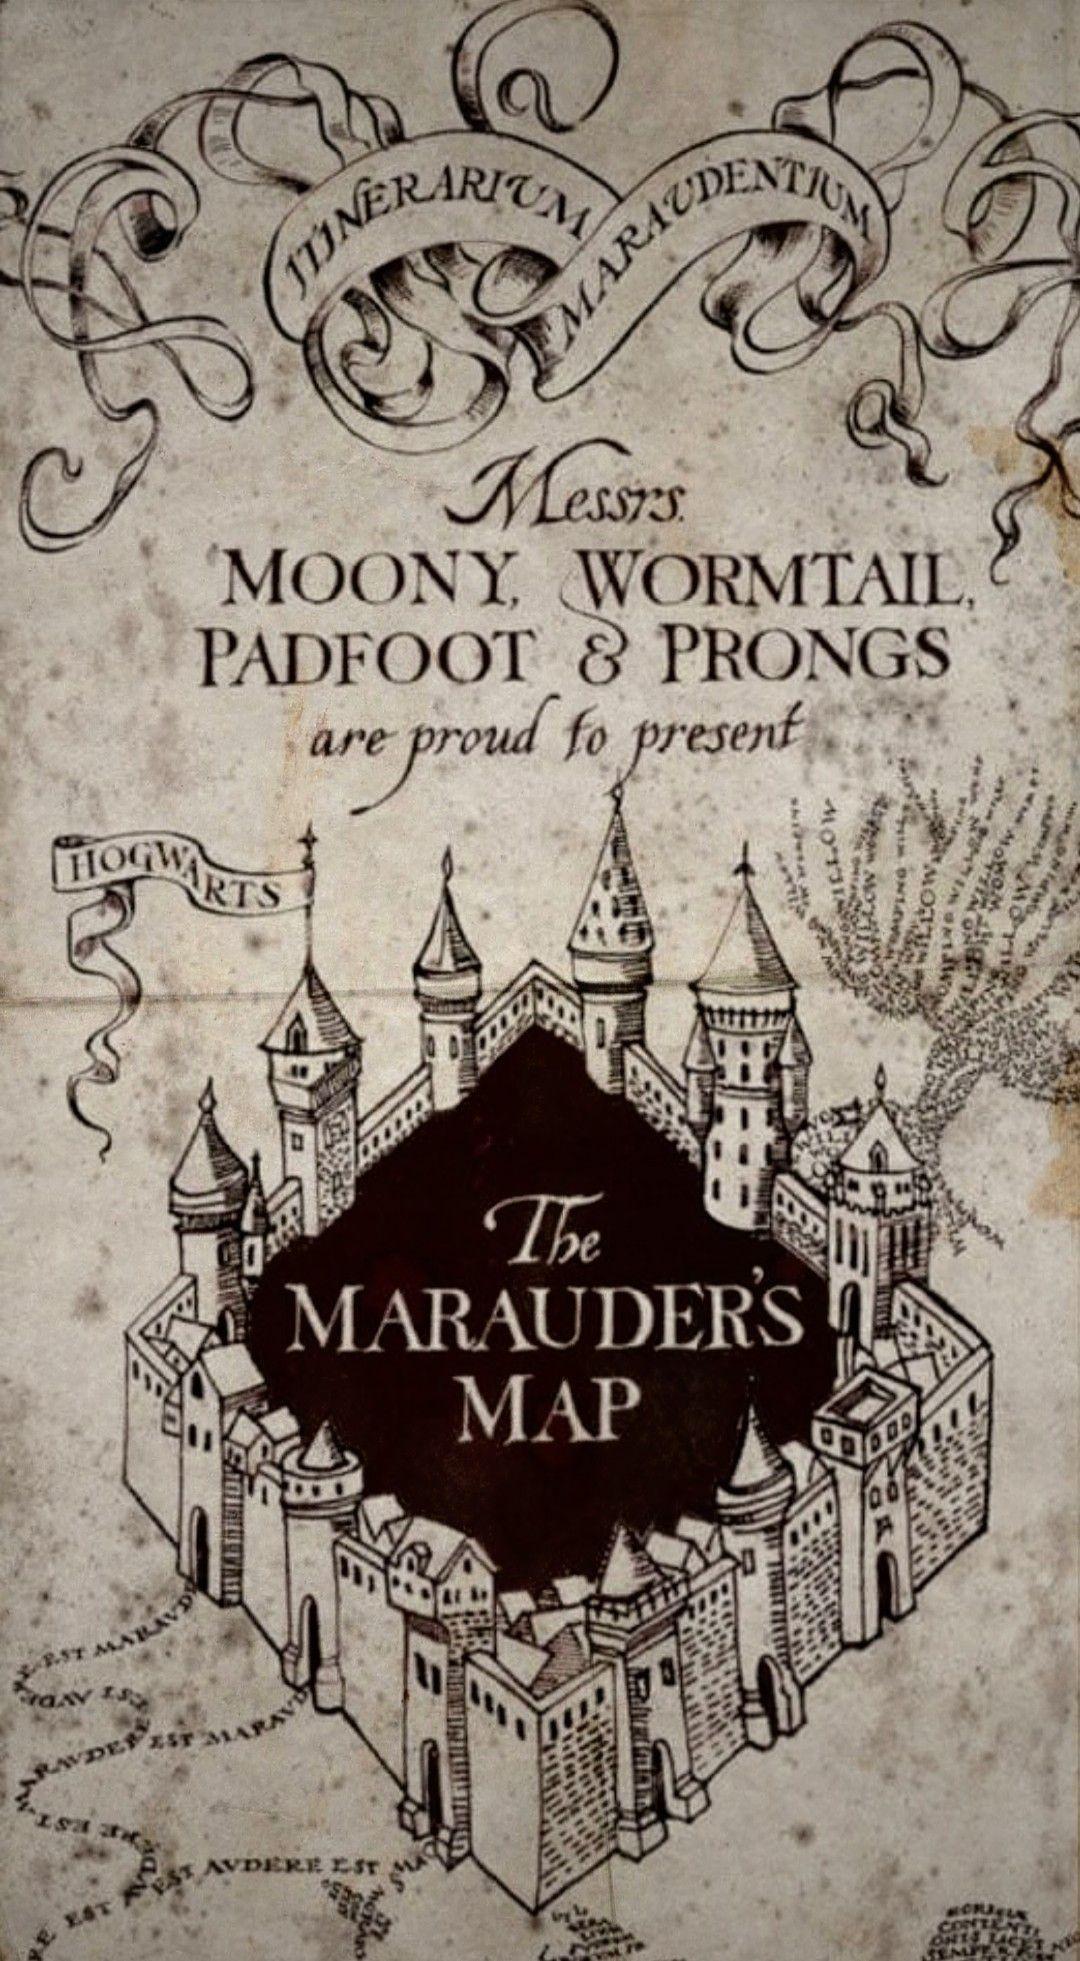 Marauder Map Can Be Use As A Wallpaper Harry Potter Wallpaper Harry Potter Marauders Map Harry Potter Marauders